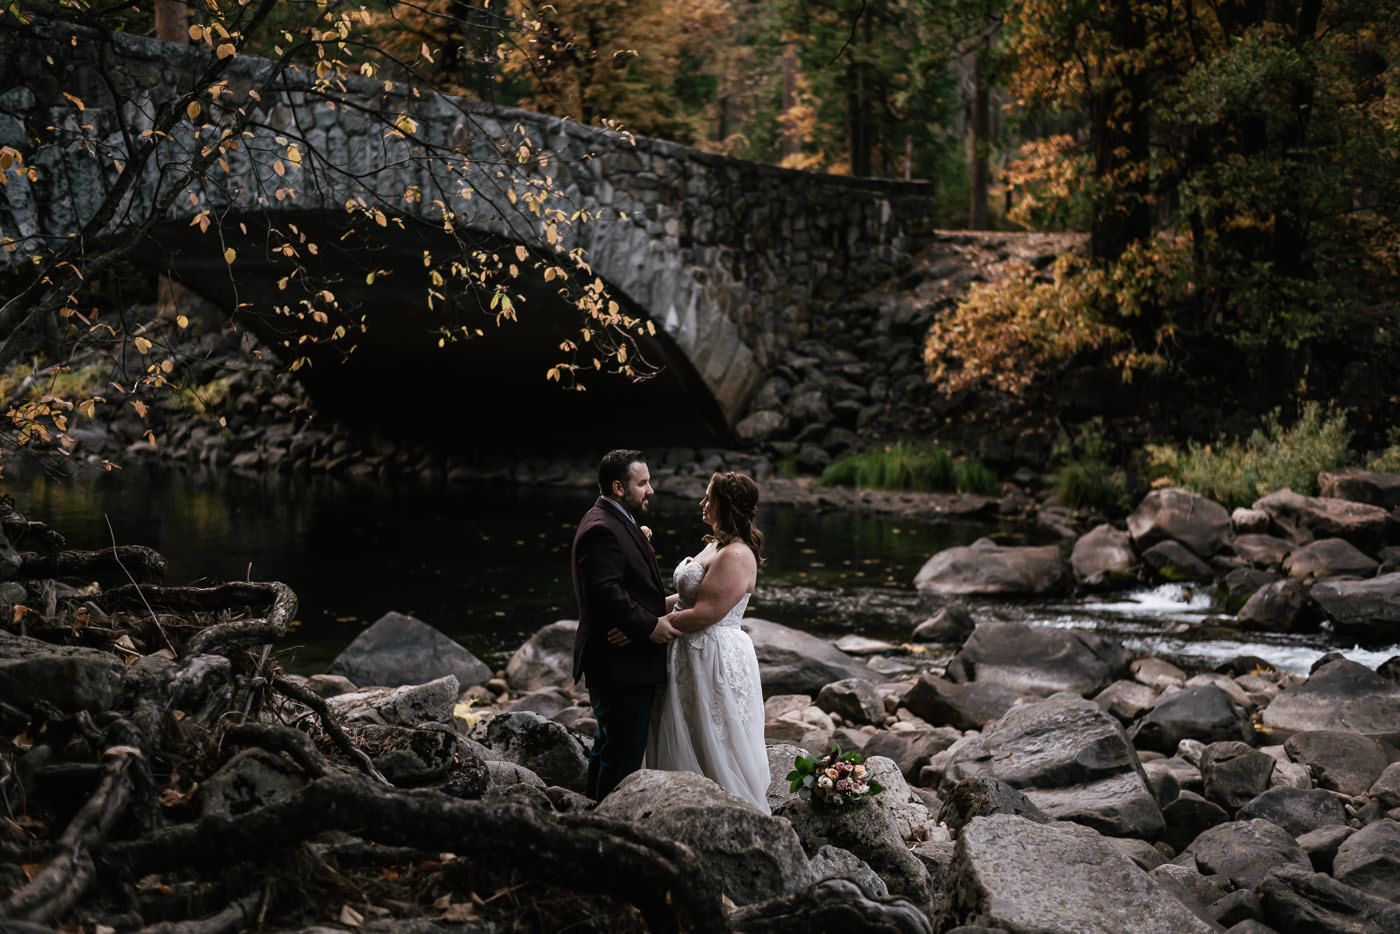 pohono-bridge-elopement-photos-yosemite-1.jpg